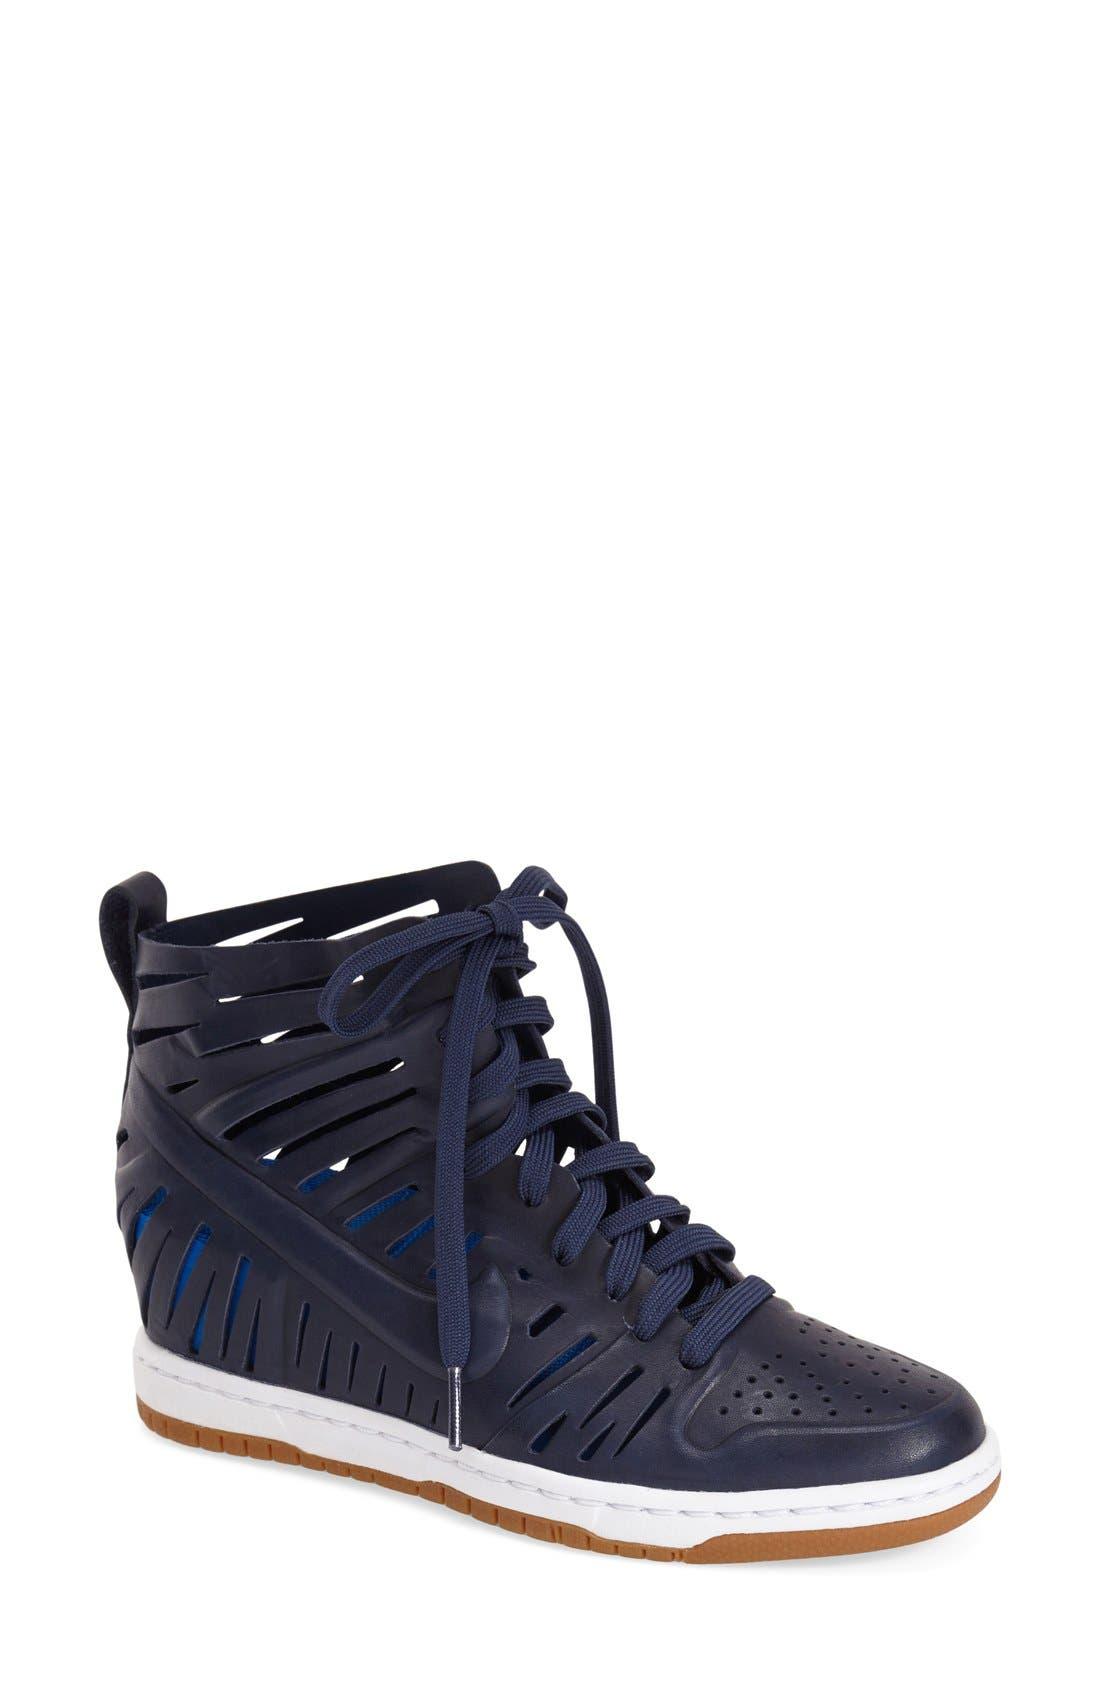 Main Image - Nike 'Dunk Sky Hi Joli' Hidden Wedge Sneaker (Women)